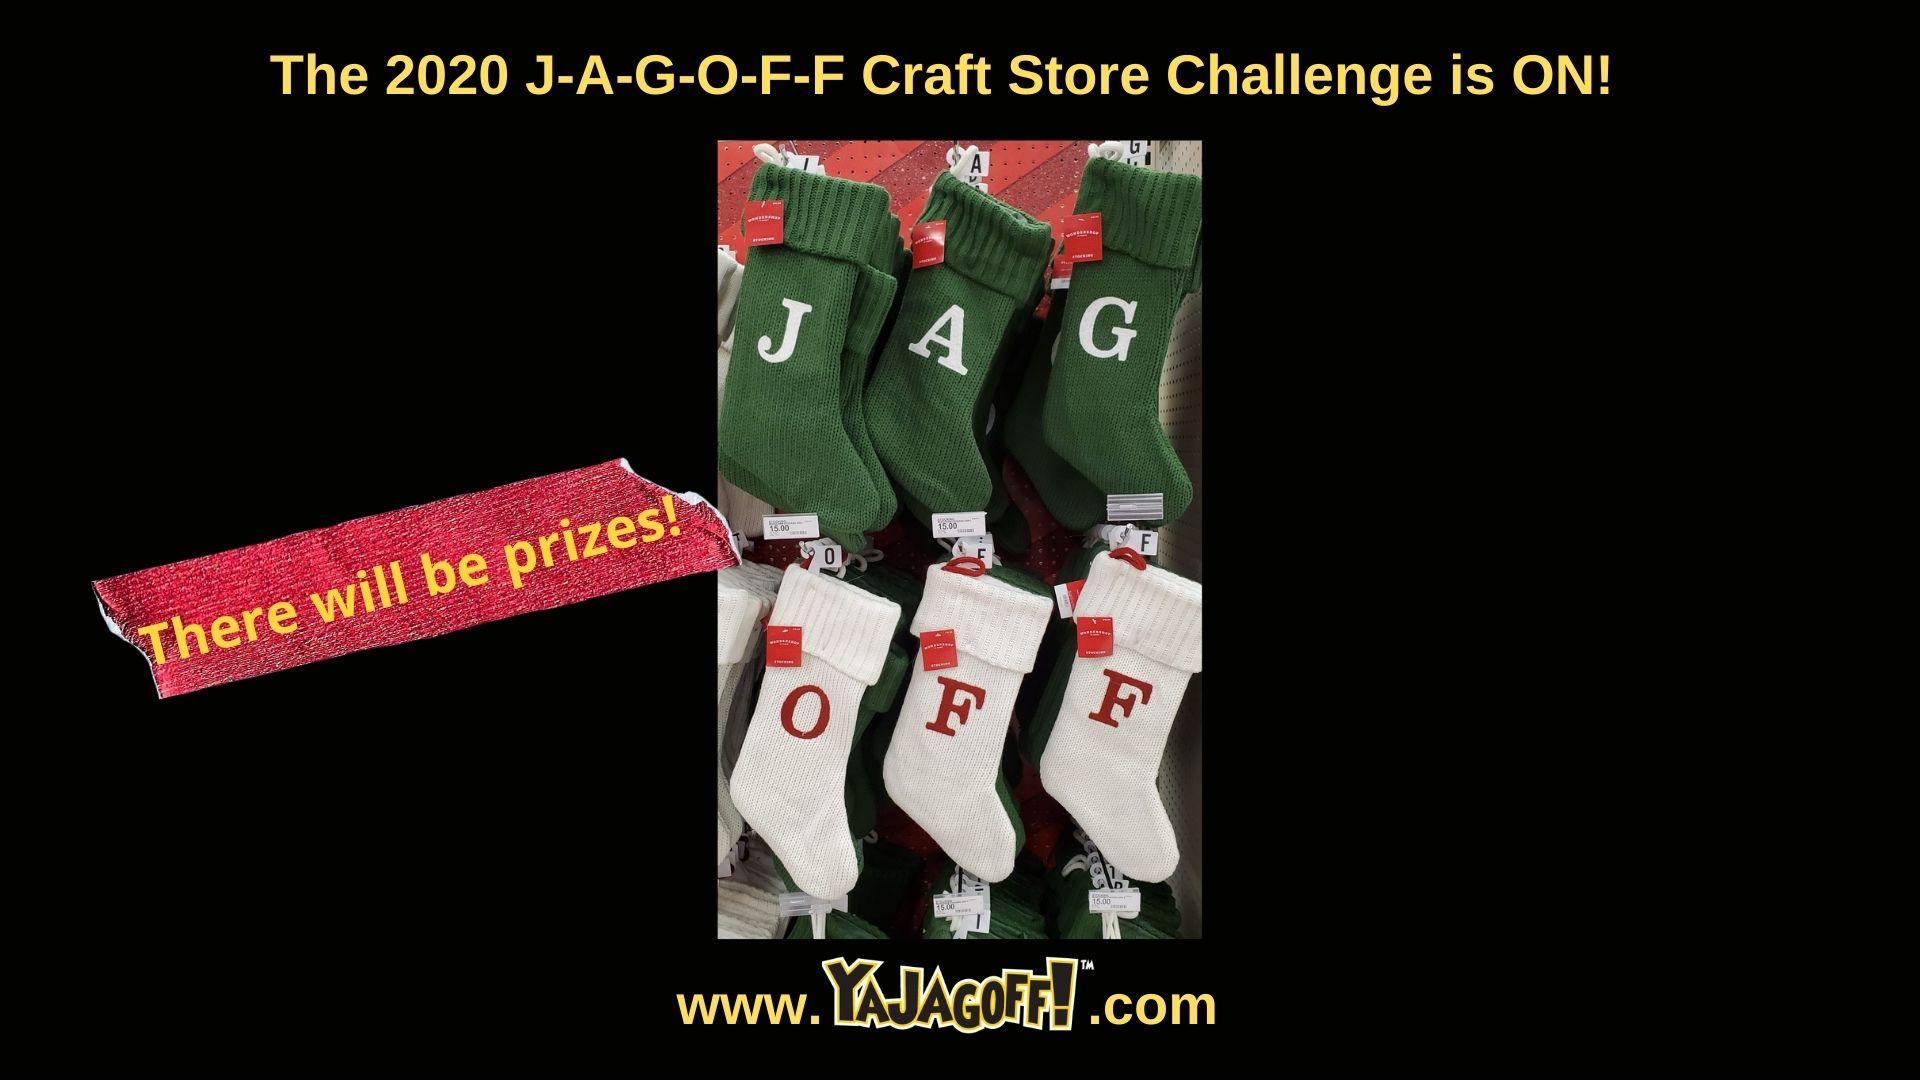 The 2020 jagoff challenge